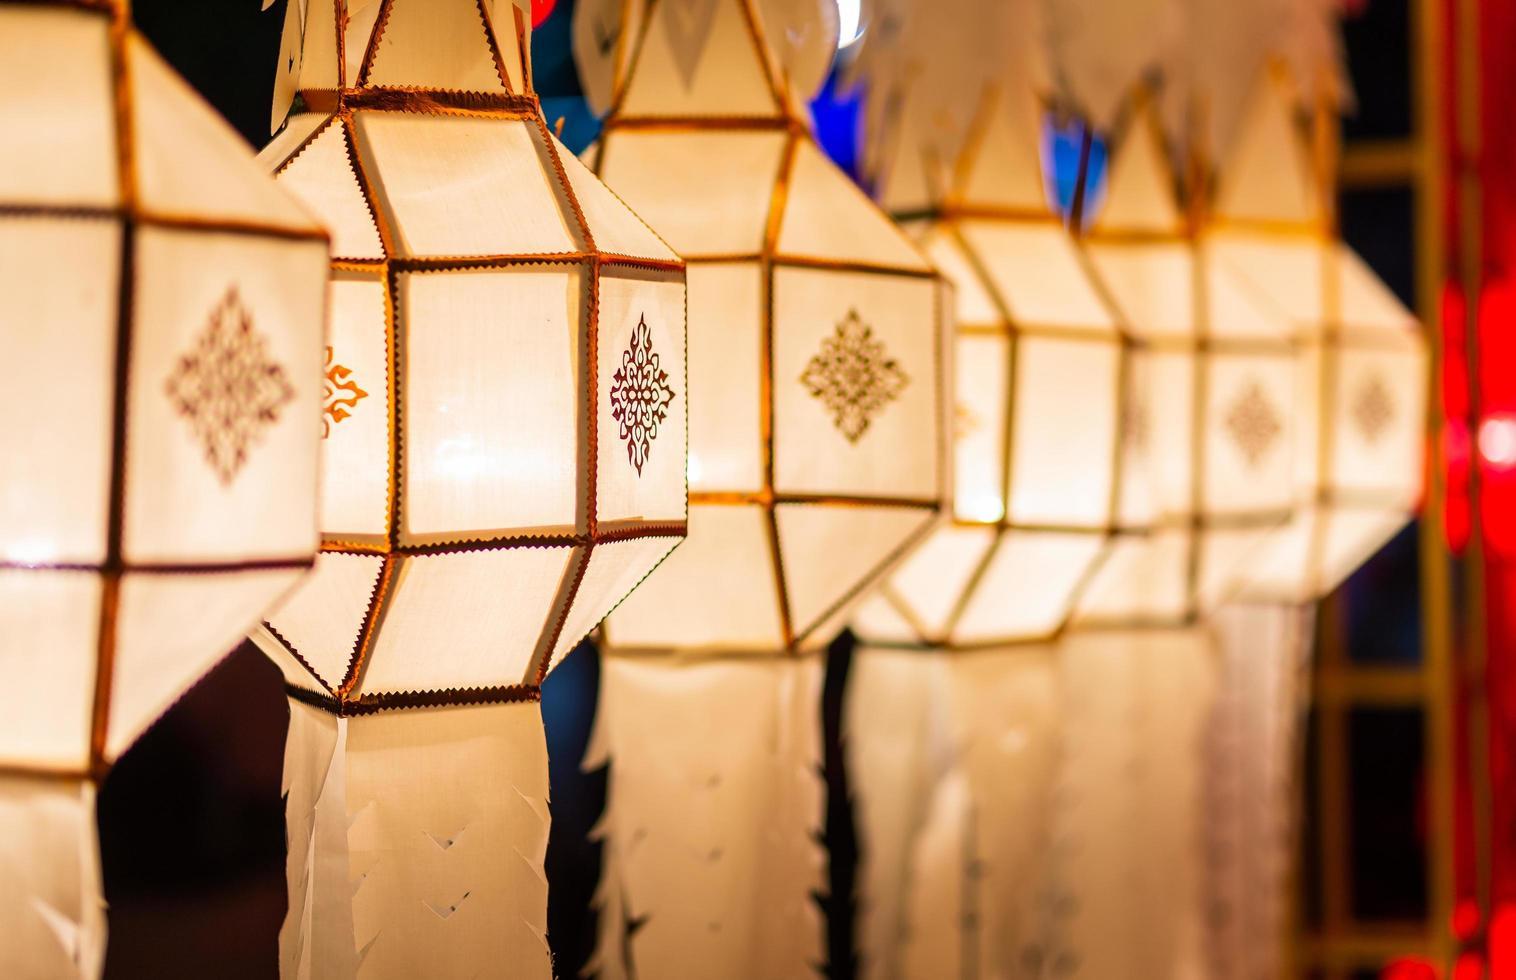 een reeks nanna-lantaarns vult de festivalzaal in thailand foto